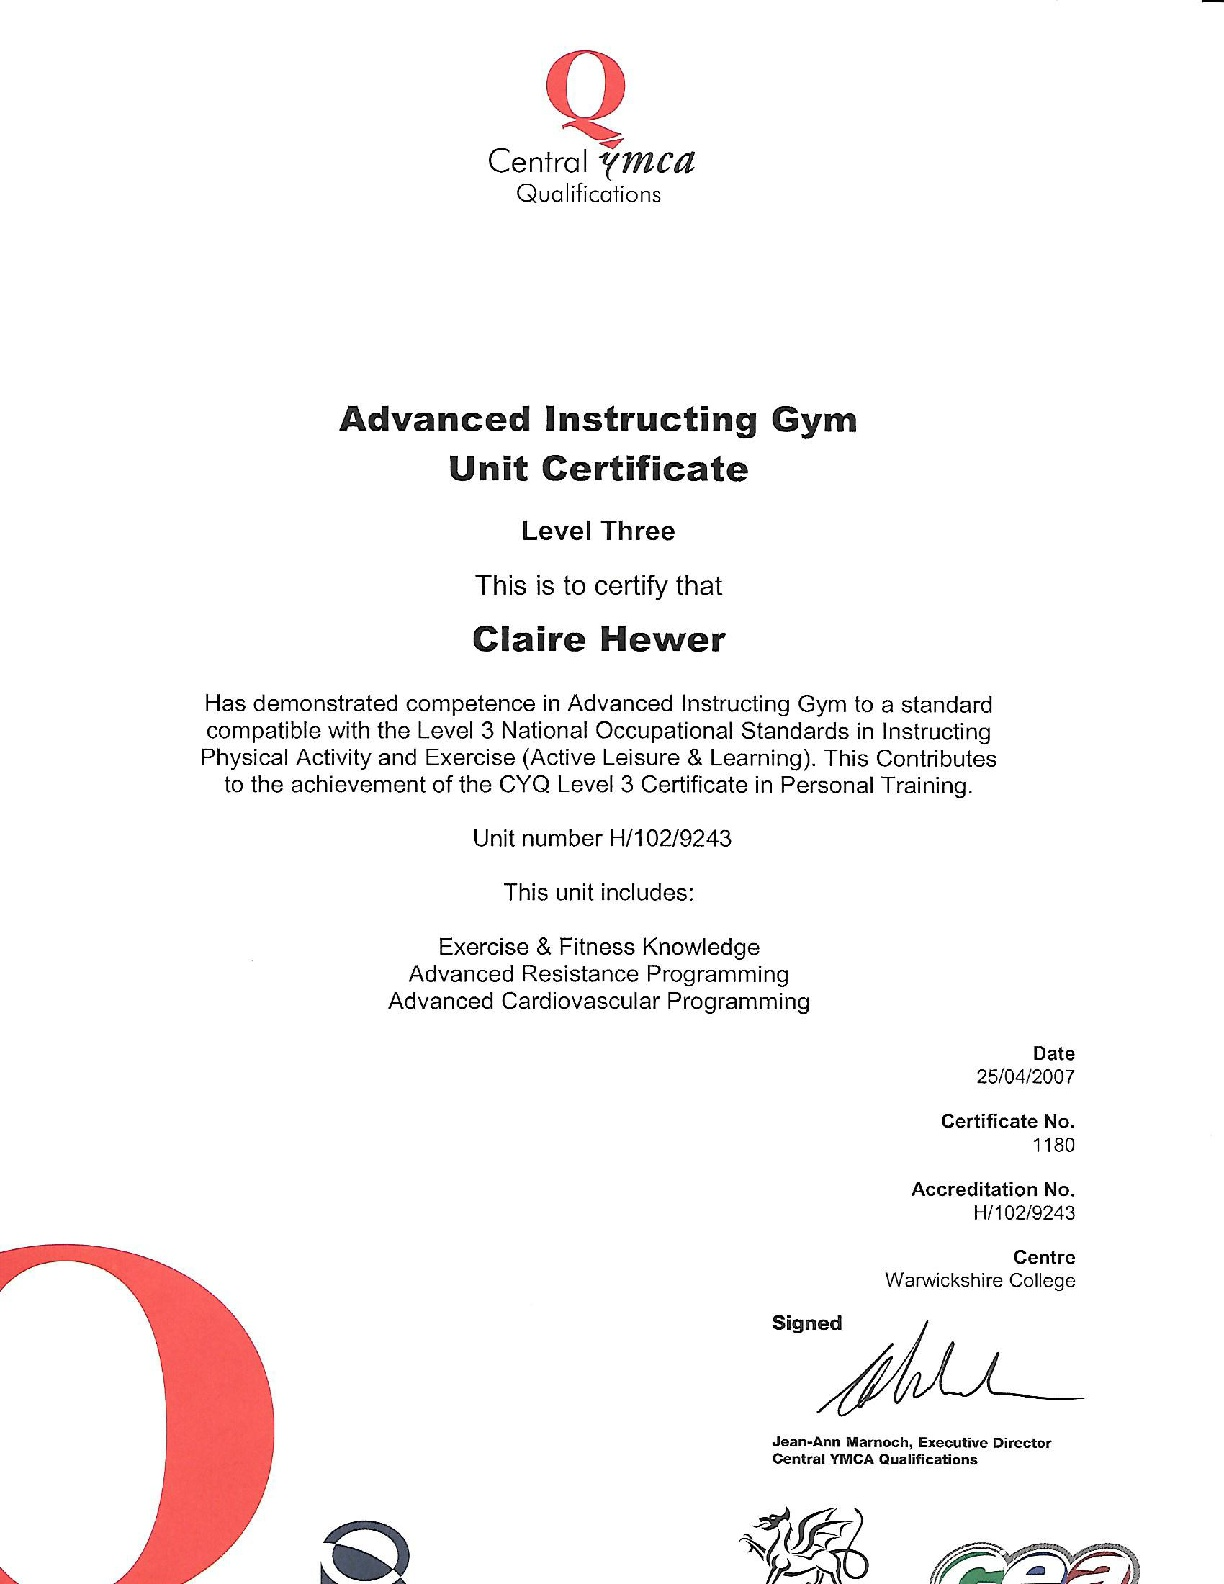 Level-3-Advanced-gym-instructor-CERT-2007-001